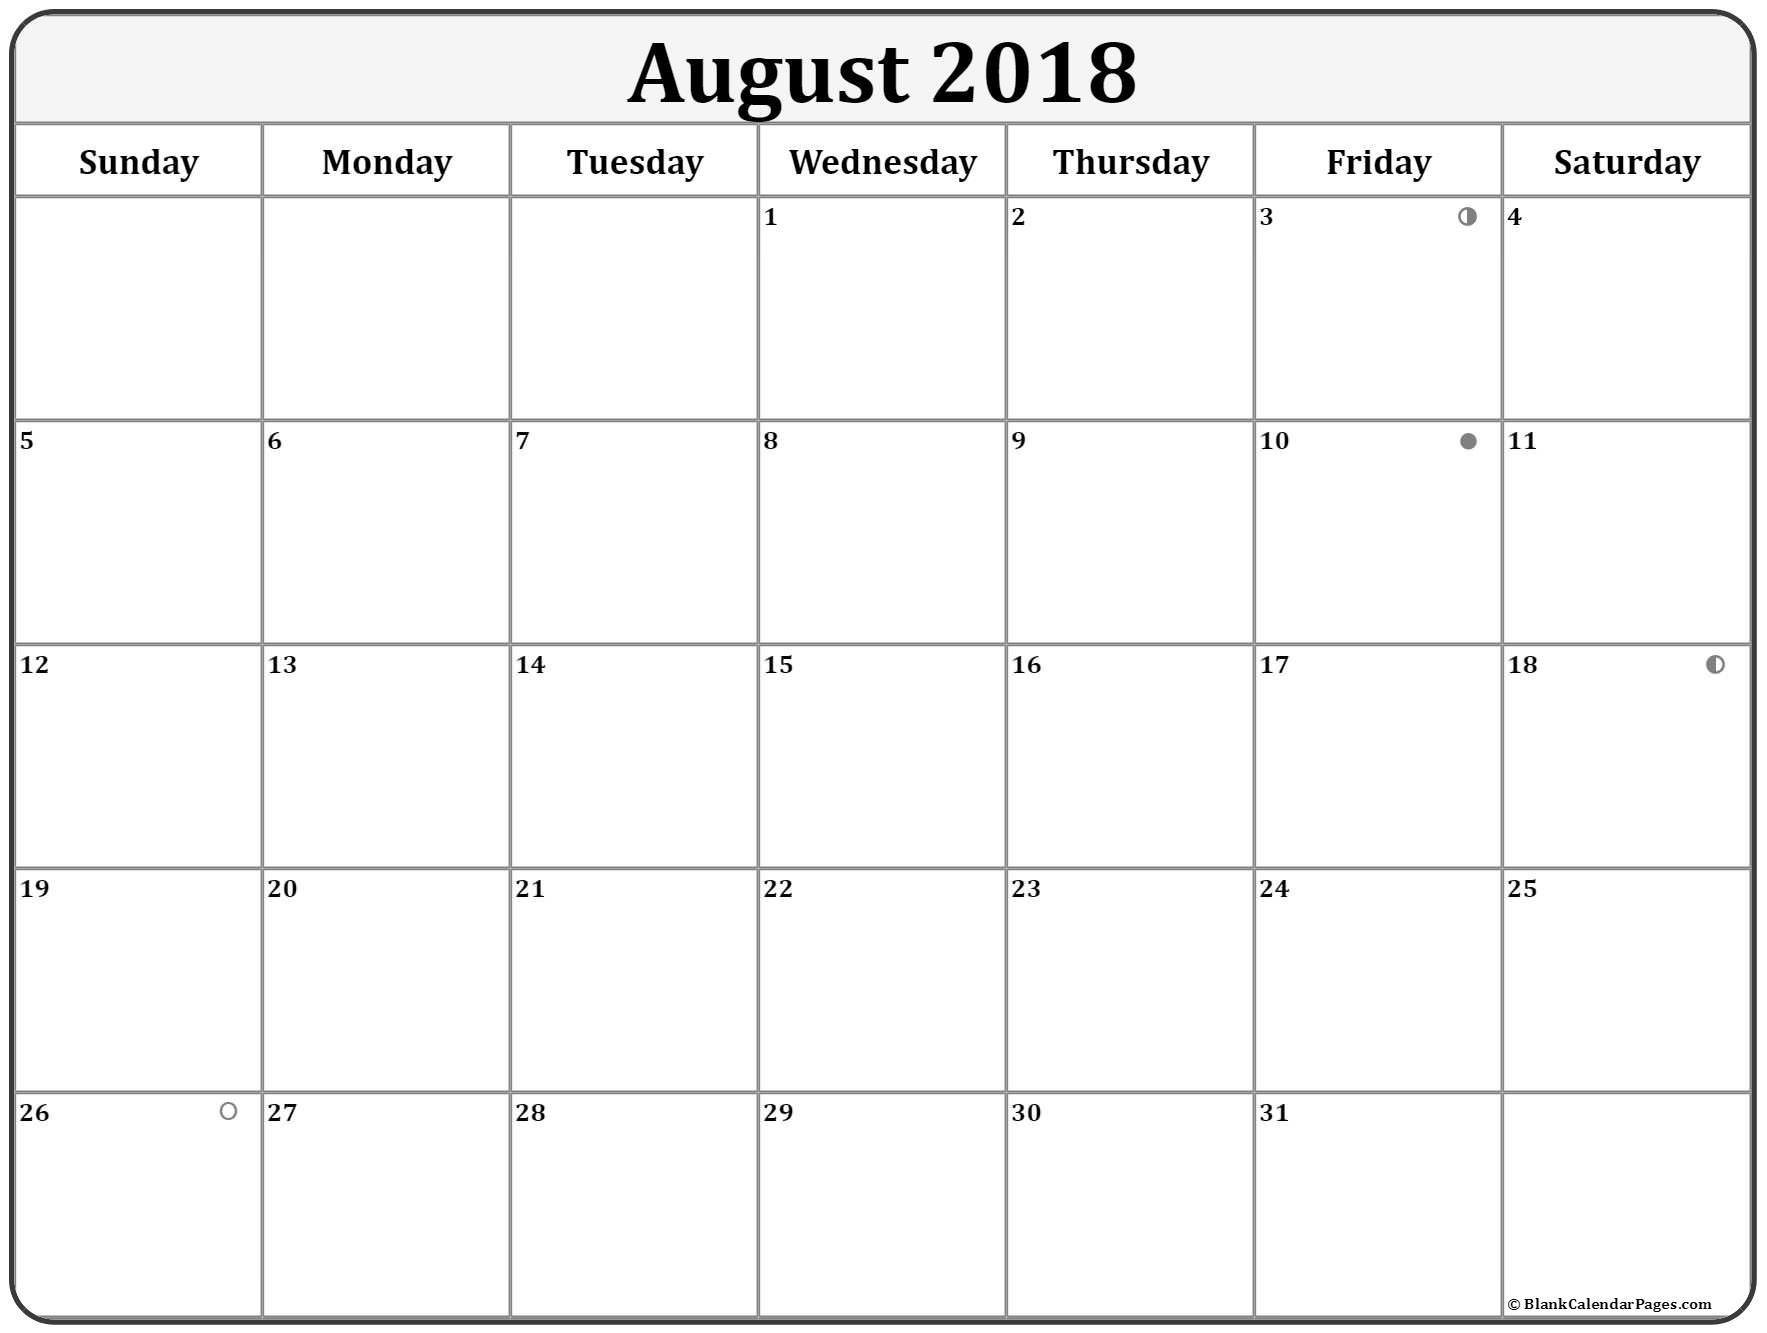 August Moon Phase Calendar